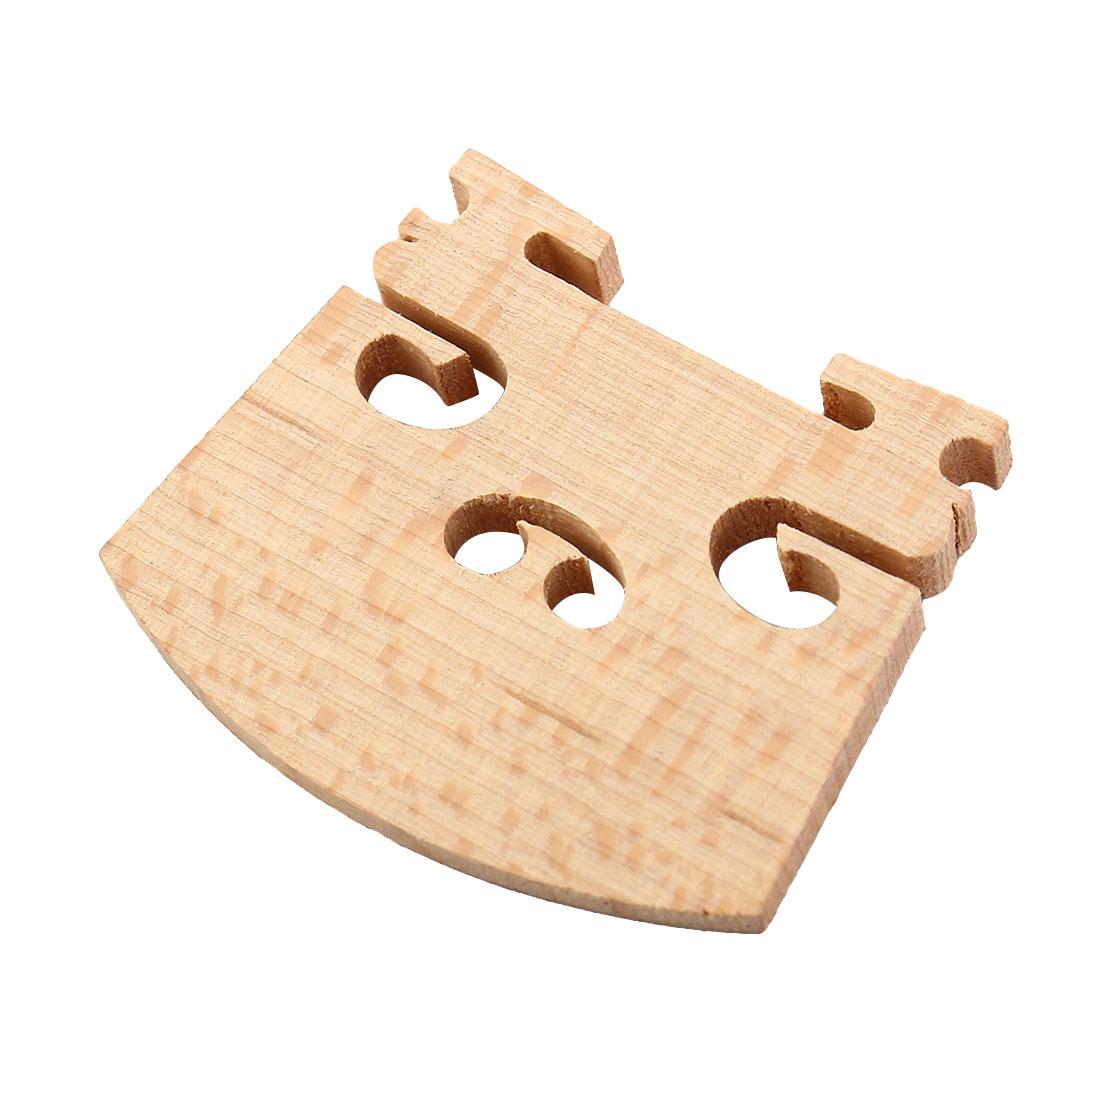 Replacement 1/4 Size Violin Parts String Centre Wooden Bridge